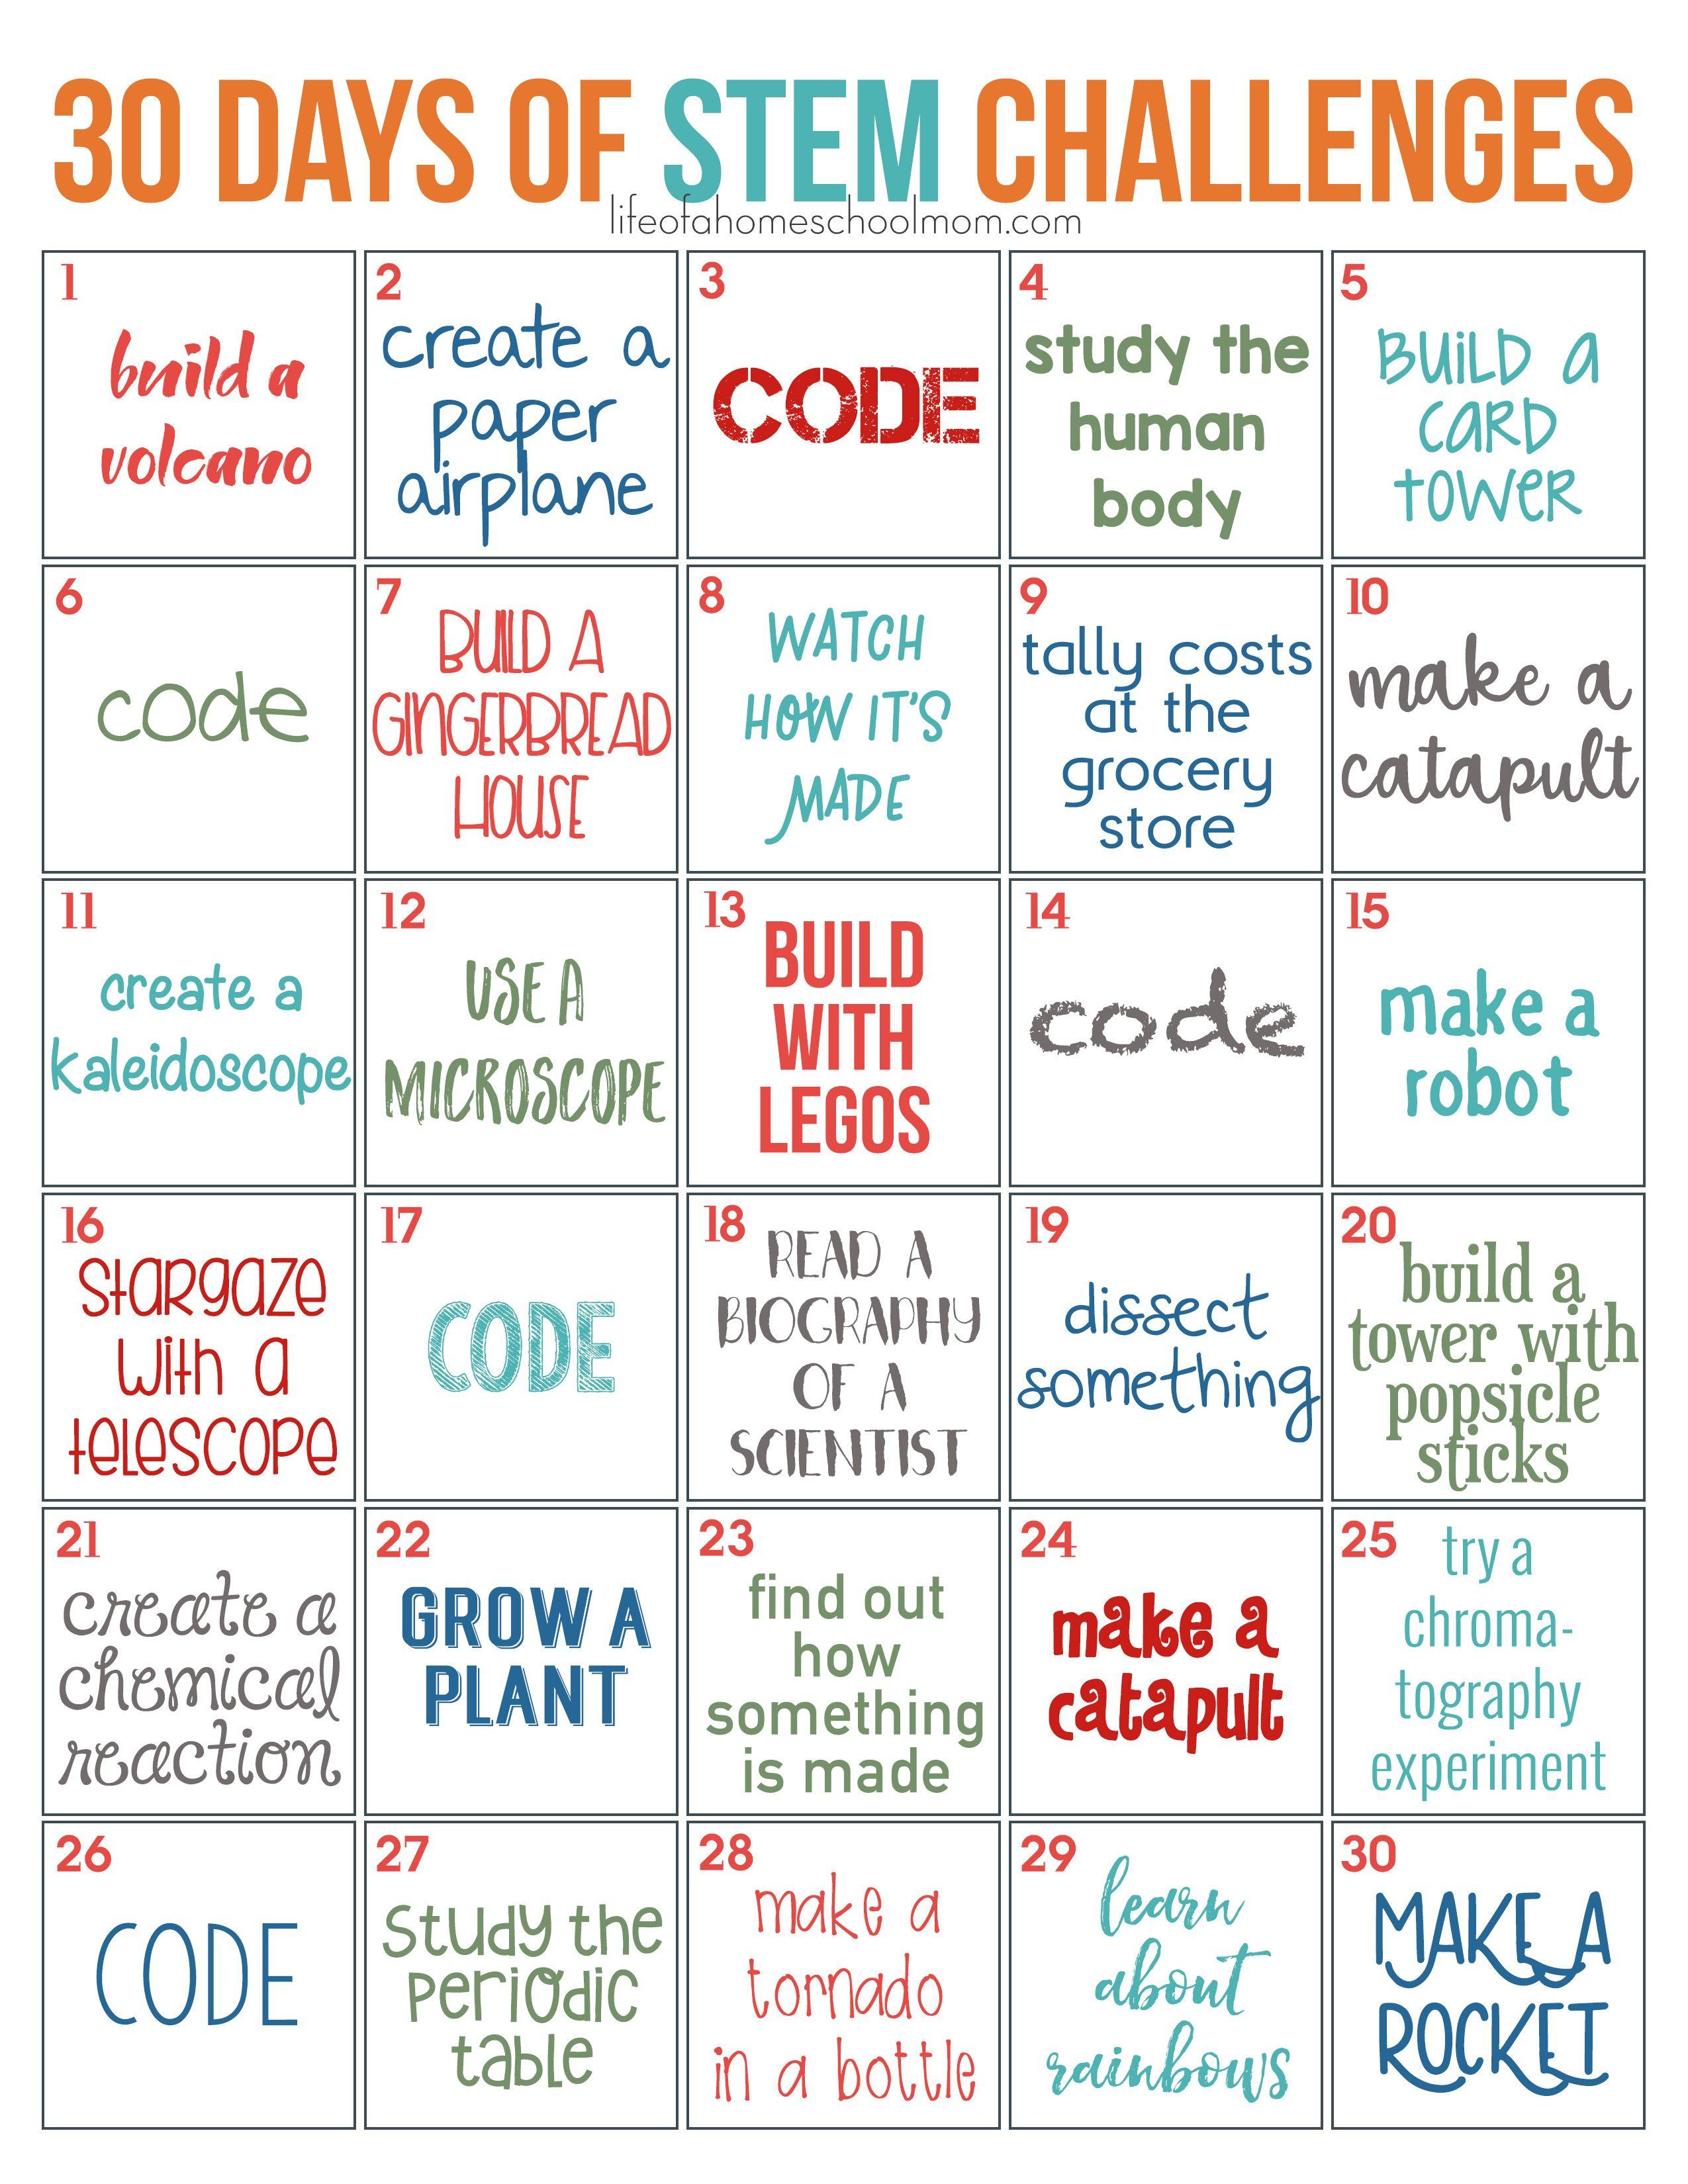 30 Days Of Stem Challenges - Free Printable | Stem Ideas | Stem - Free Printable Stem Activities